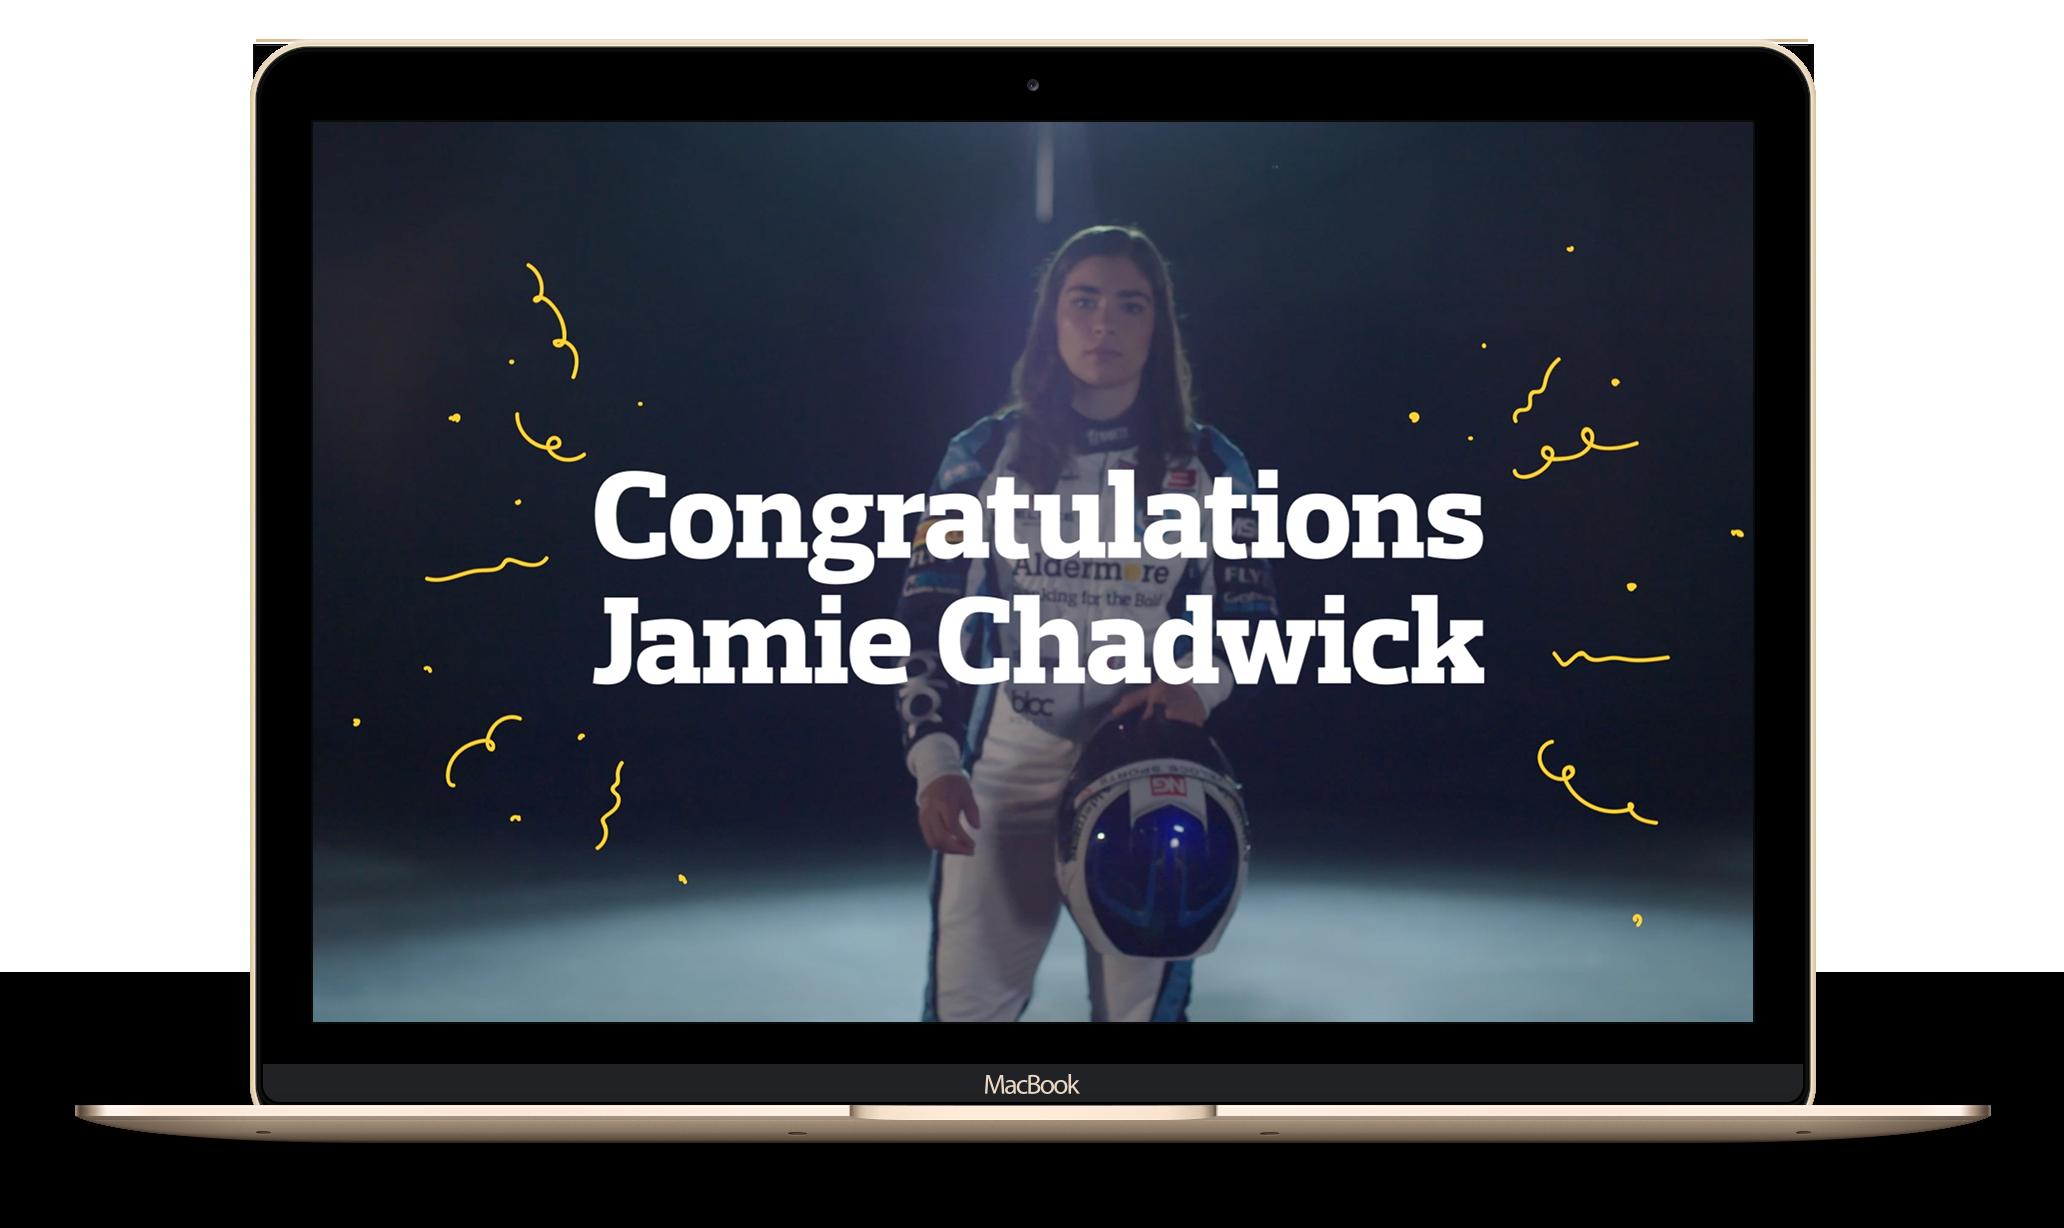 Jamie_Chadwick_video.png